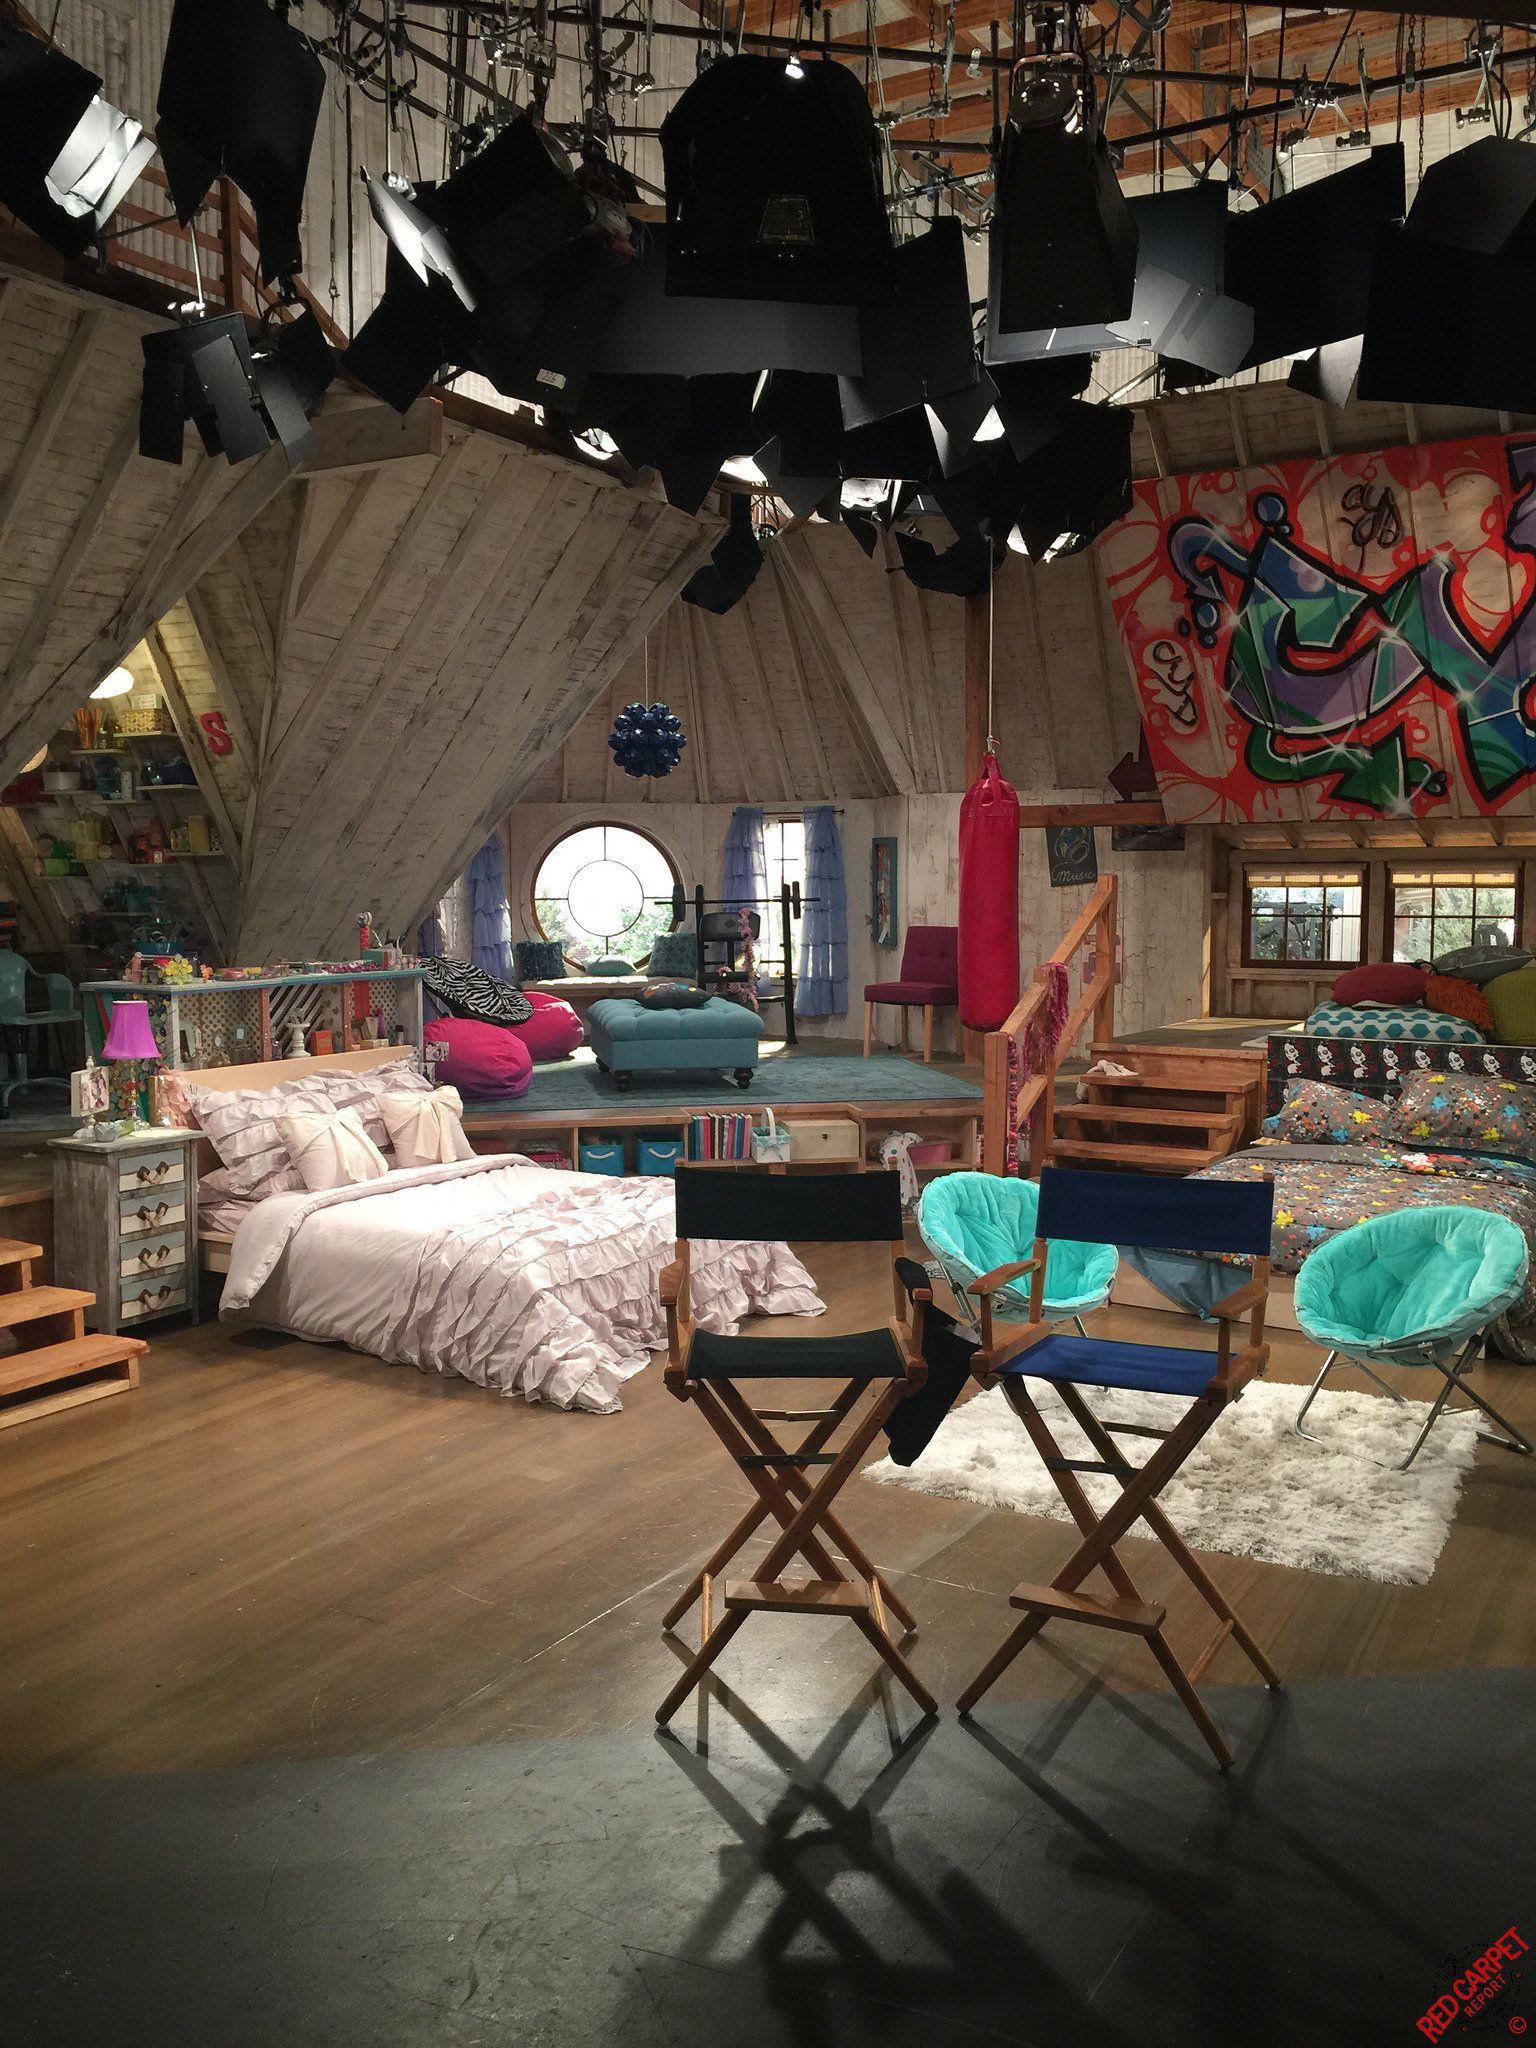 Best Friends Whenever Set Visit Disney Channel S New Buddy Comedy Bestfriendsforever Img 1797 Best Friends Whenever Movie Bedroom Bedroom Inspirations